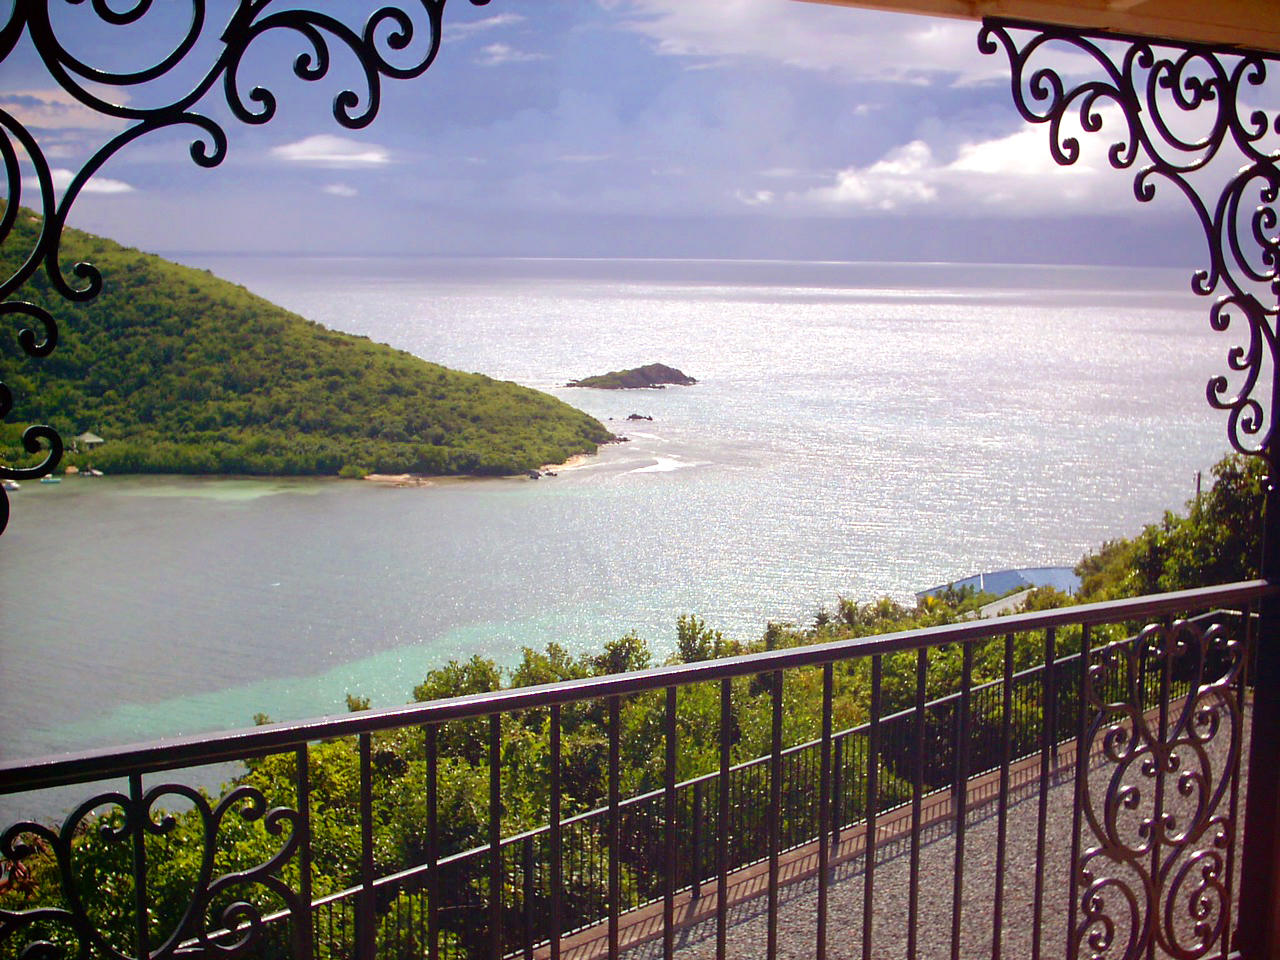 St John, Virgin Islands 00830, 3 Bedrooms Bedrooms, ,2 BathroomsBathrooms,Residential,For Sale,18-321